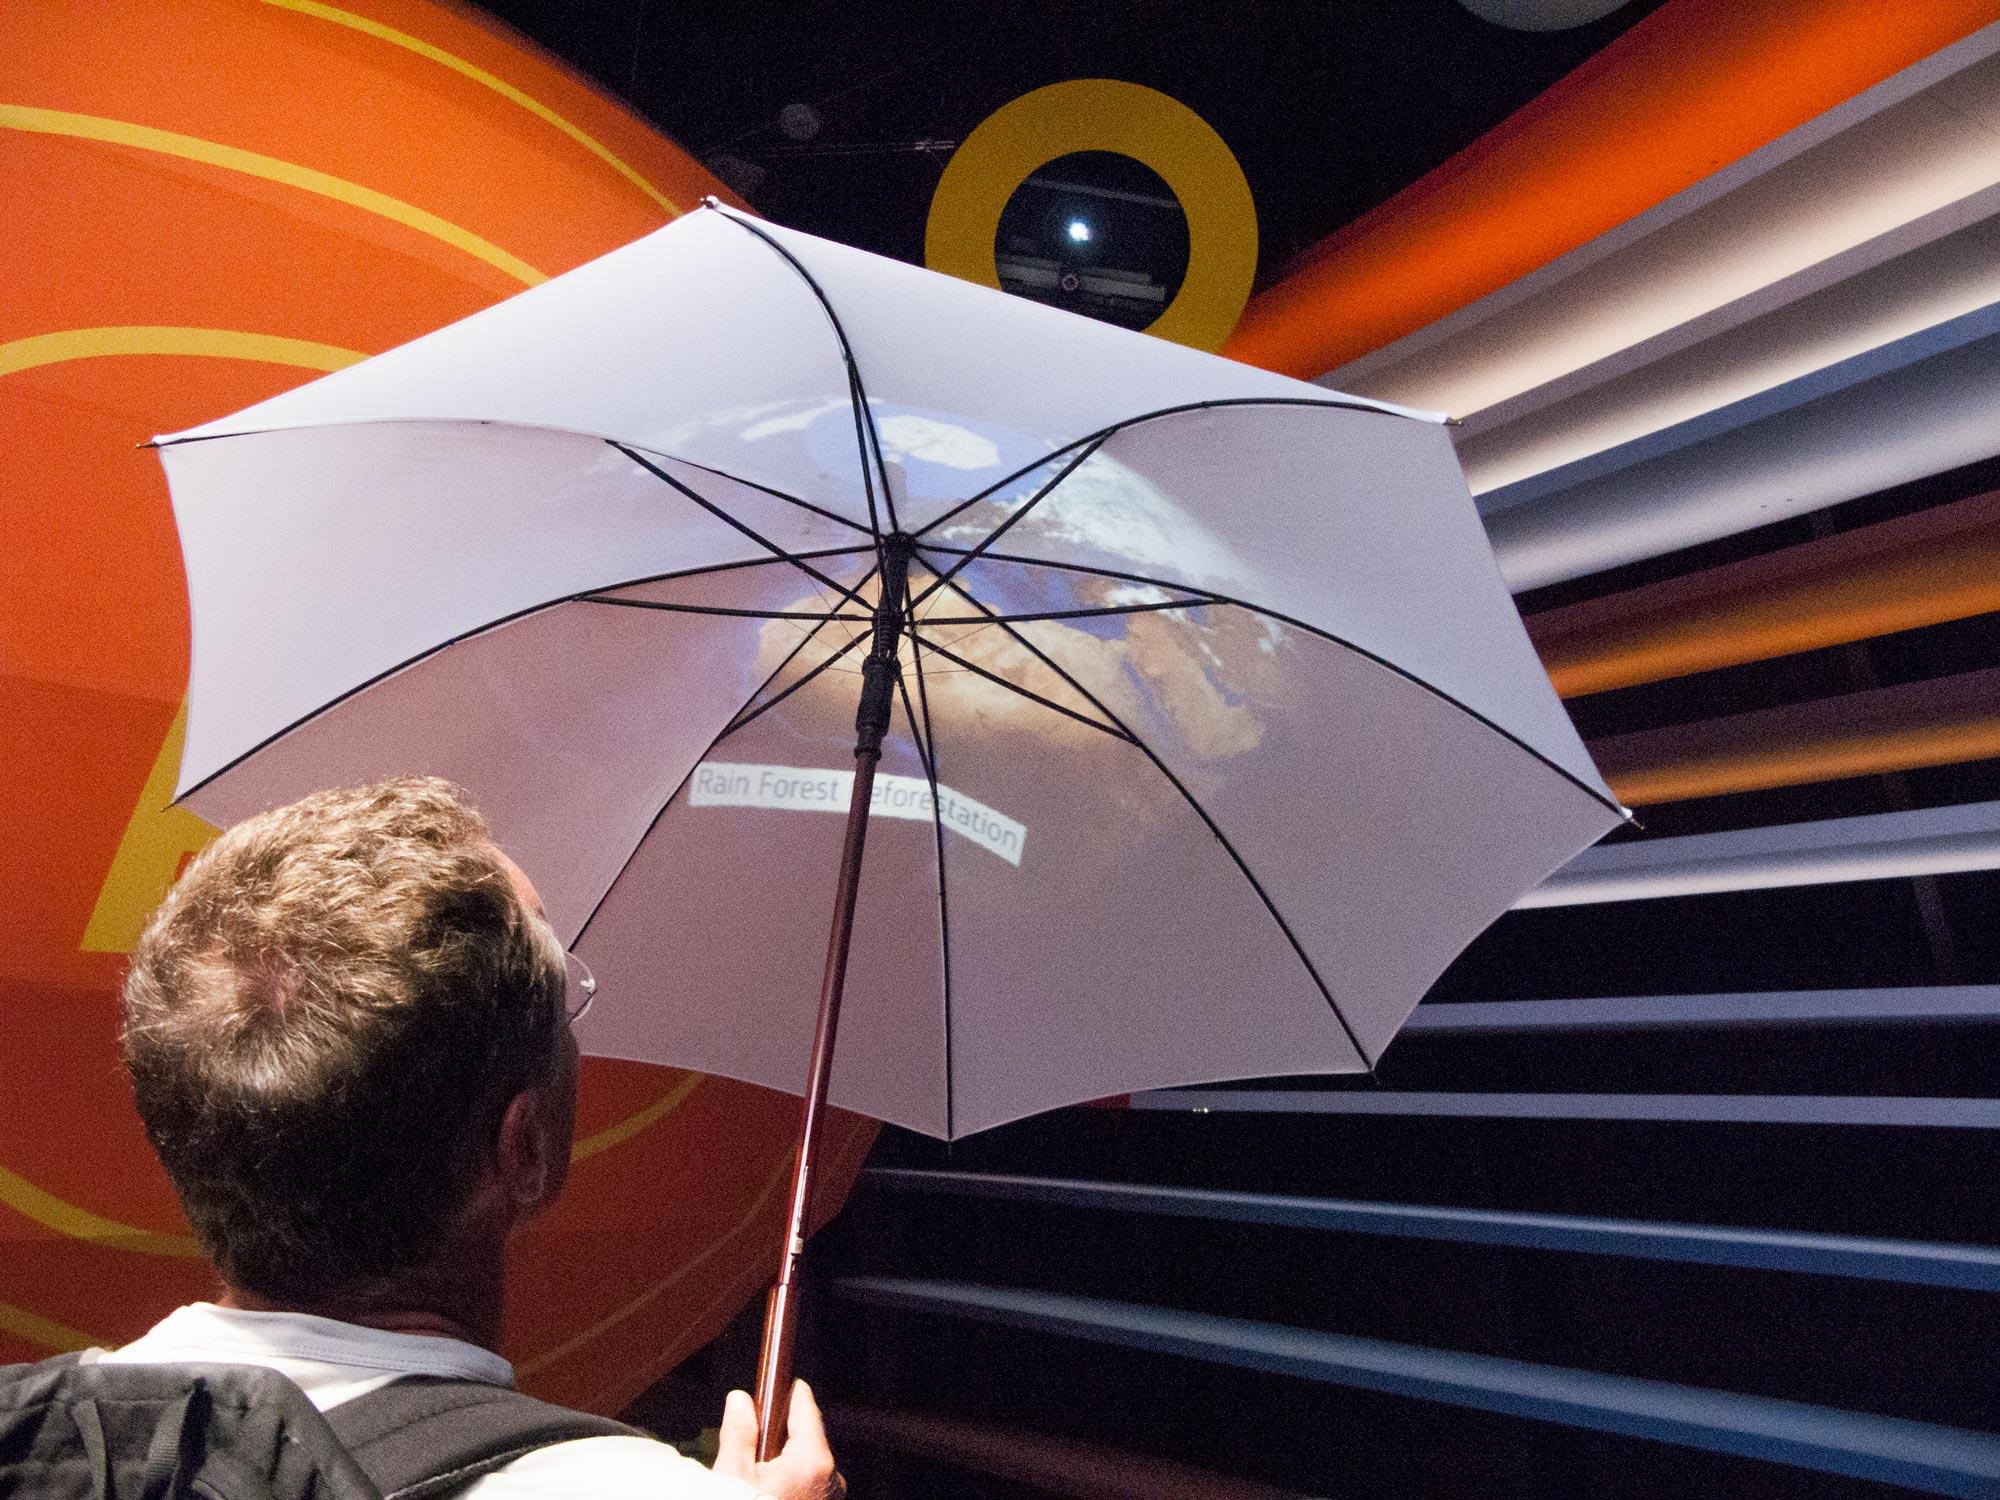 Milan Expo Germany interactive umbrella